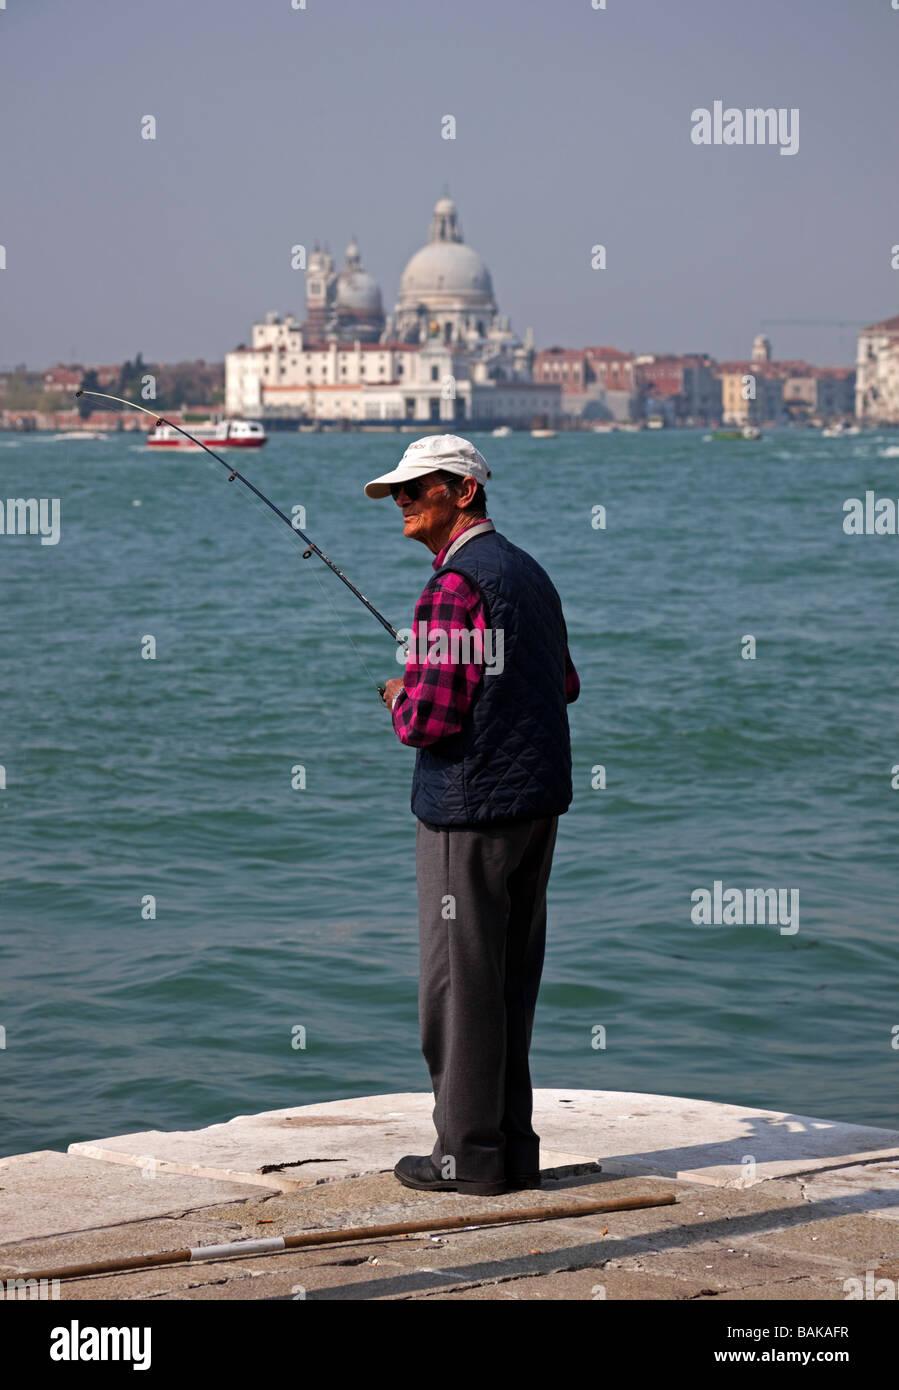 old Male fishing Bacino di San Marco Venice Italy relaxing leisure - Stock Image